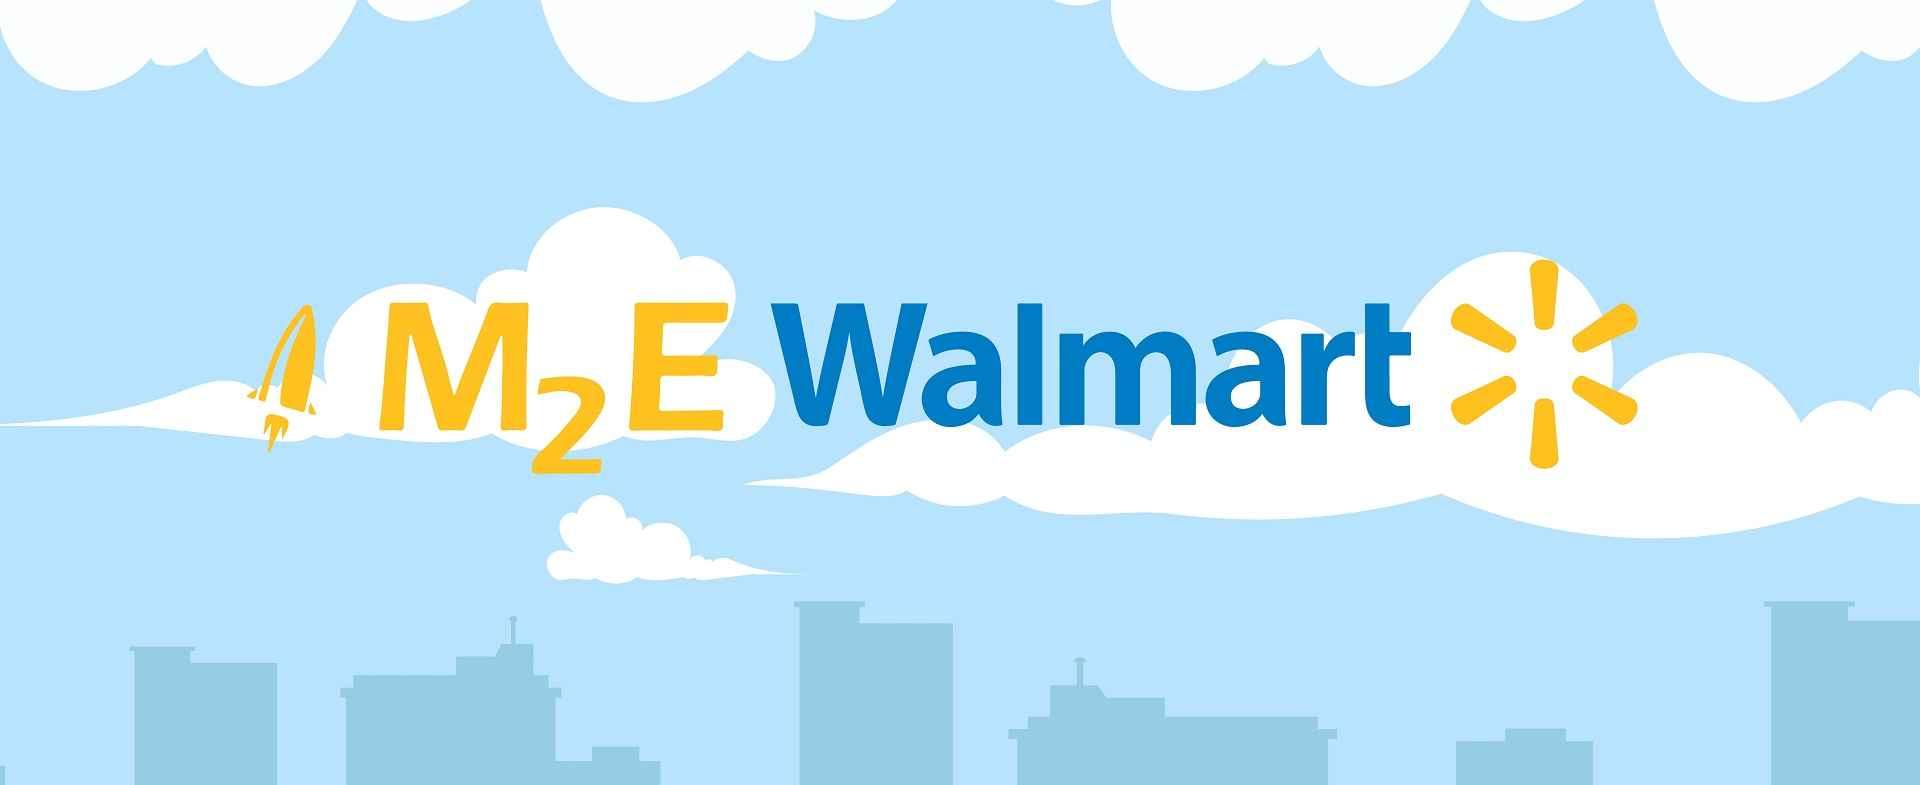 Walmart in an article on Branding Video